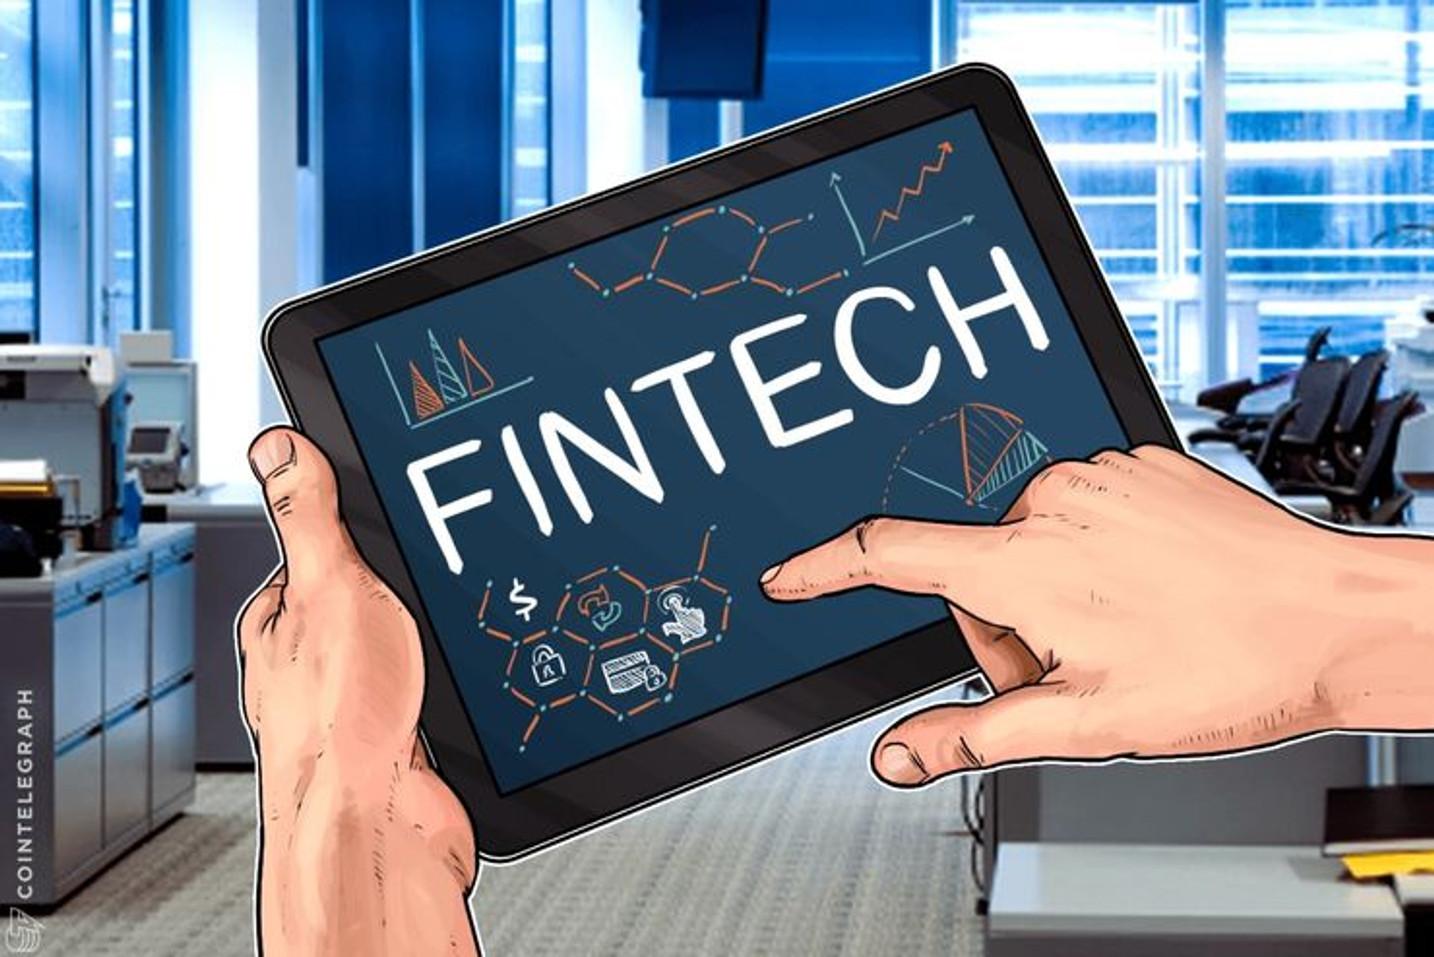 La Asociación Española de Fintech e Insurtech anunció que aspira a un crecimiento del 35 por ciento en 2019